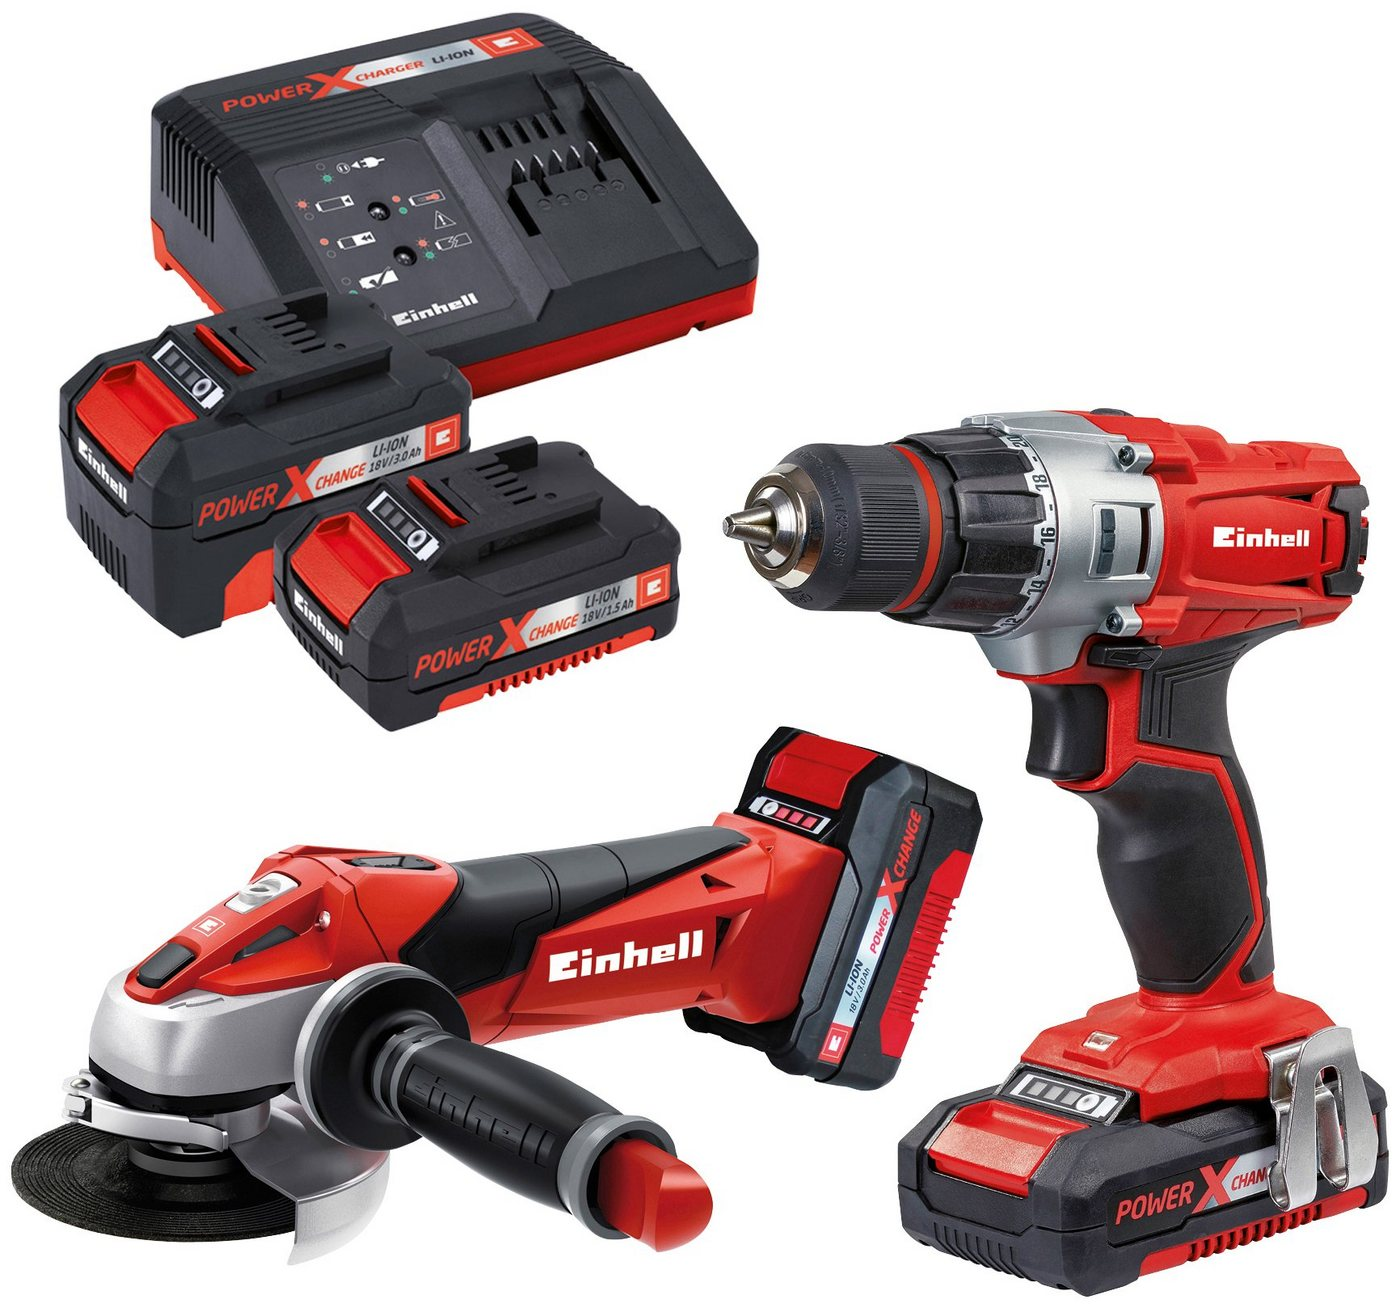 EINHELL Elektrowerkzeug-Set »TE-TK 18 Li Kit«, Akku-Winkelschleifer & Akku-Bohrschrauber, 2 Li-Ion-Akkus | Baumarkt > Werkzeug > Werkzeug-Sets | Rot | Einhell